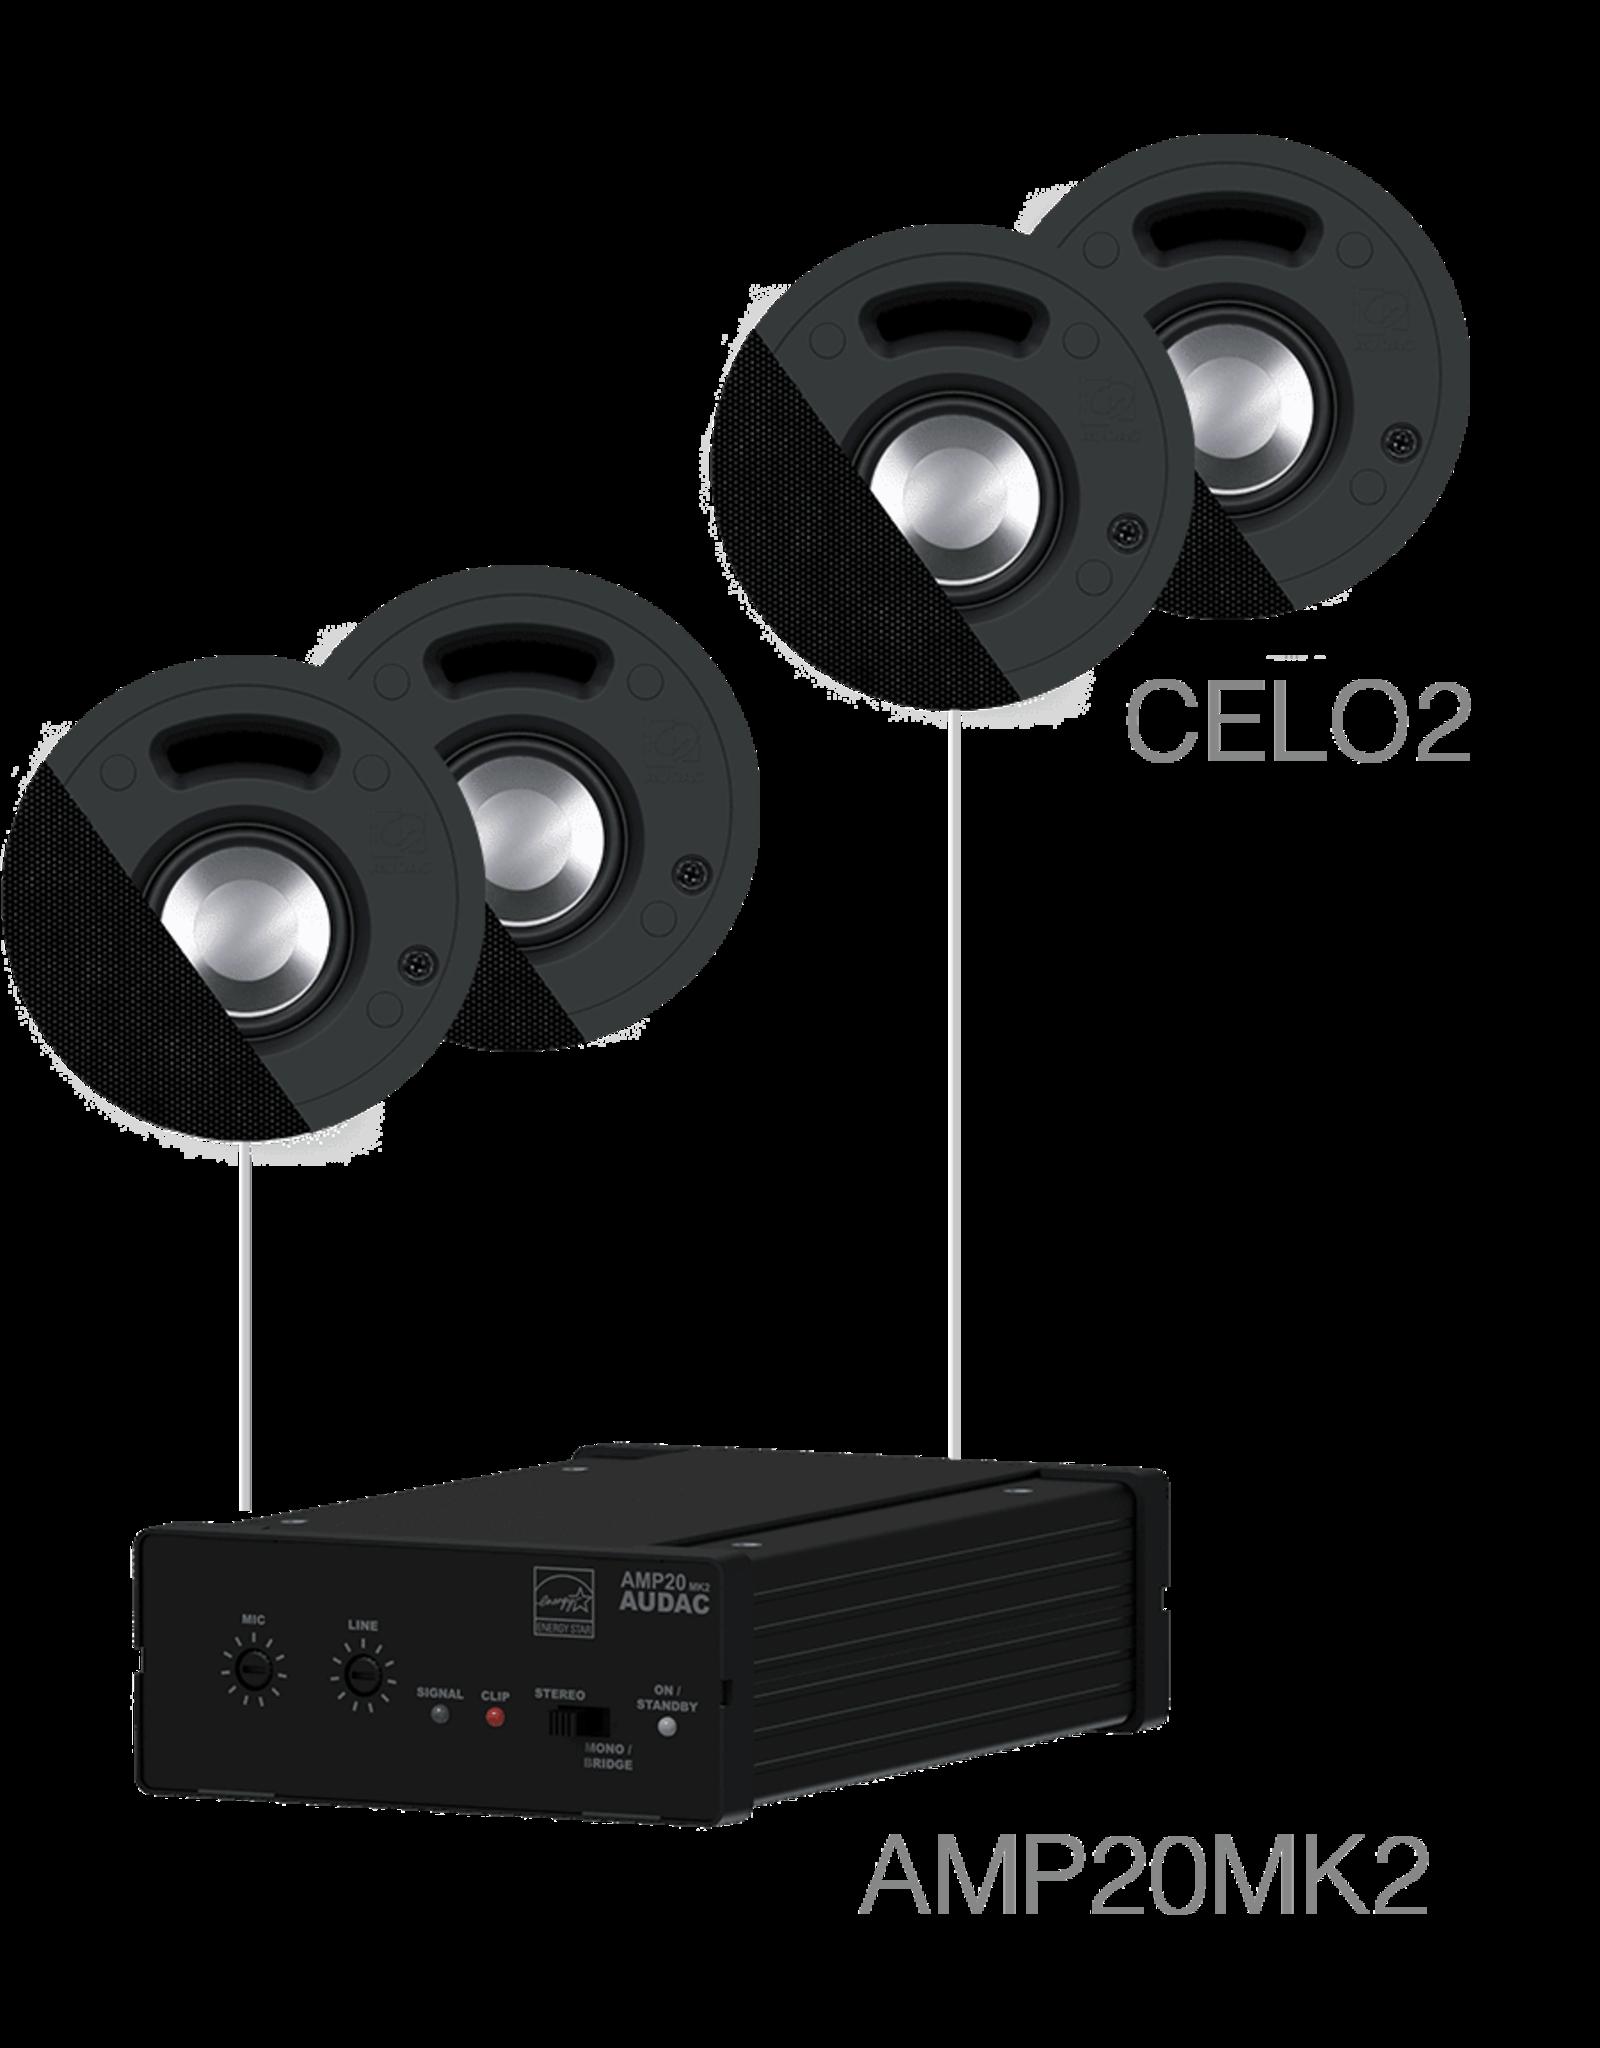 Audac 4 x CELO2 + AMP20 Black version